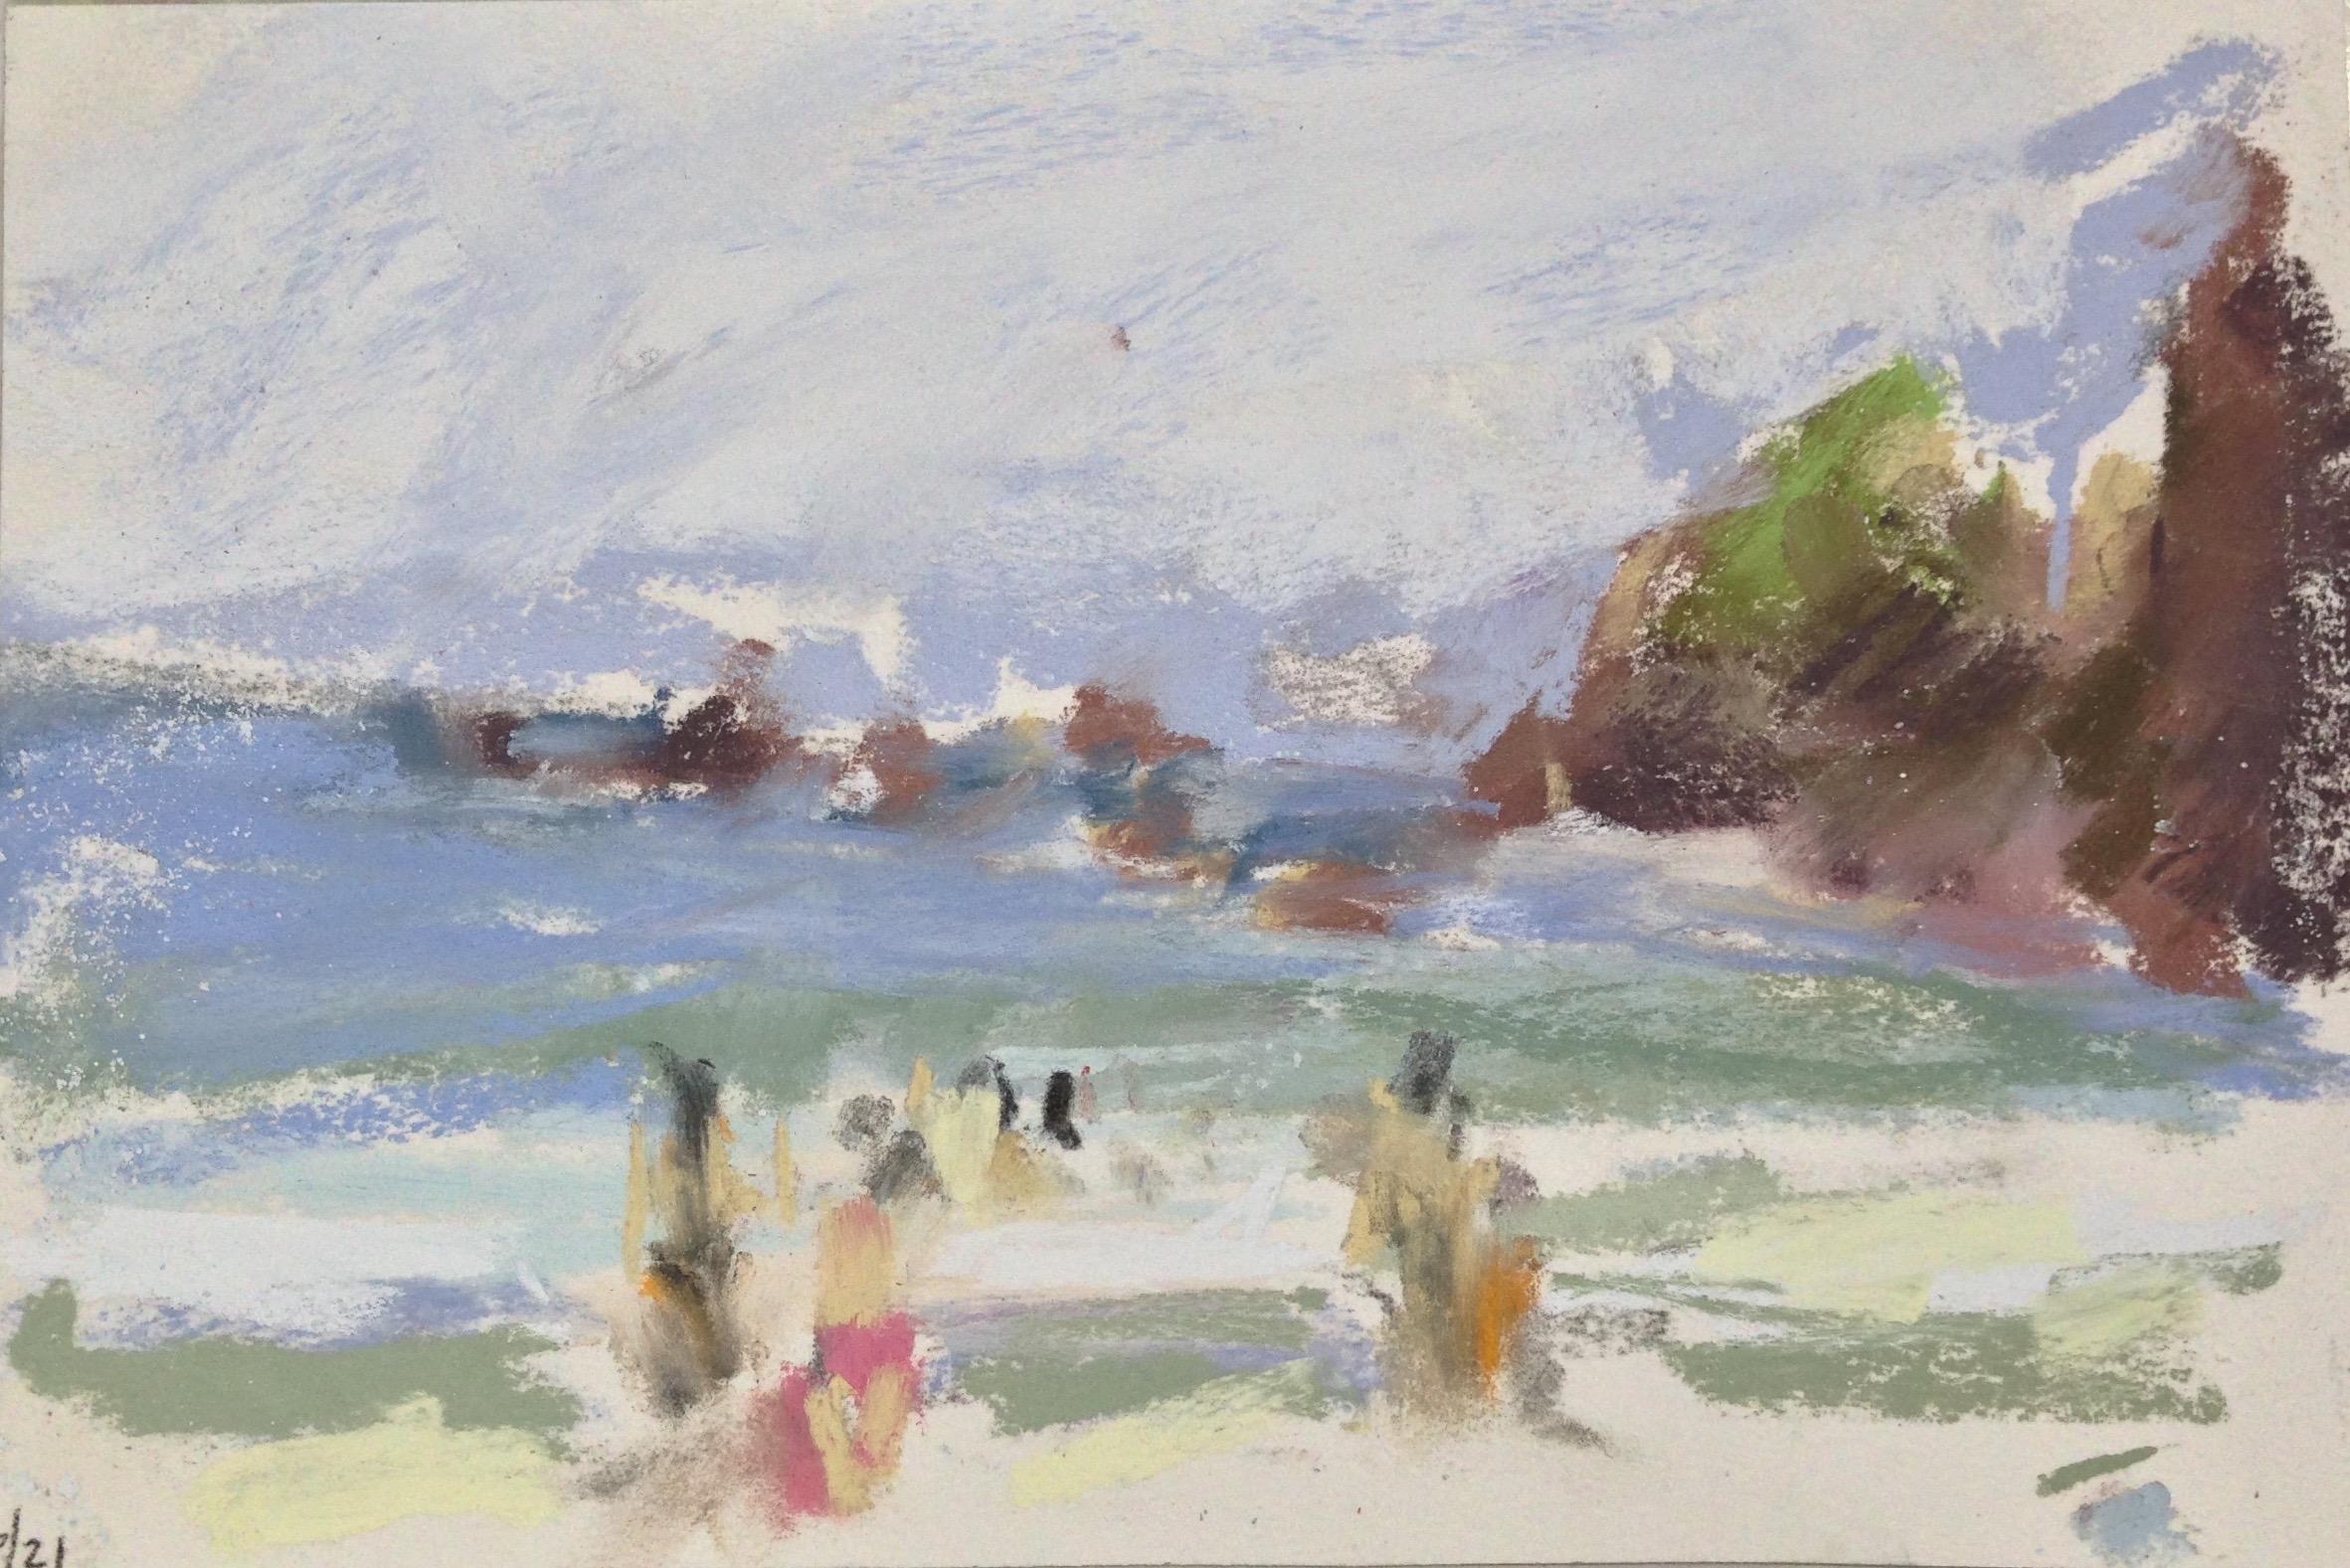 Playa Xilo Beach